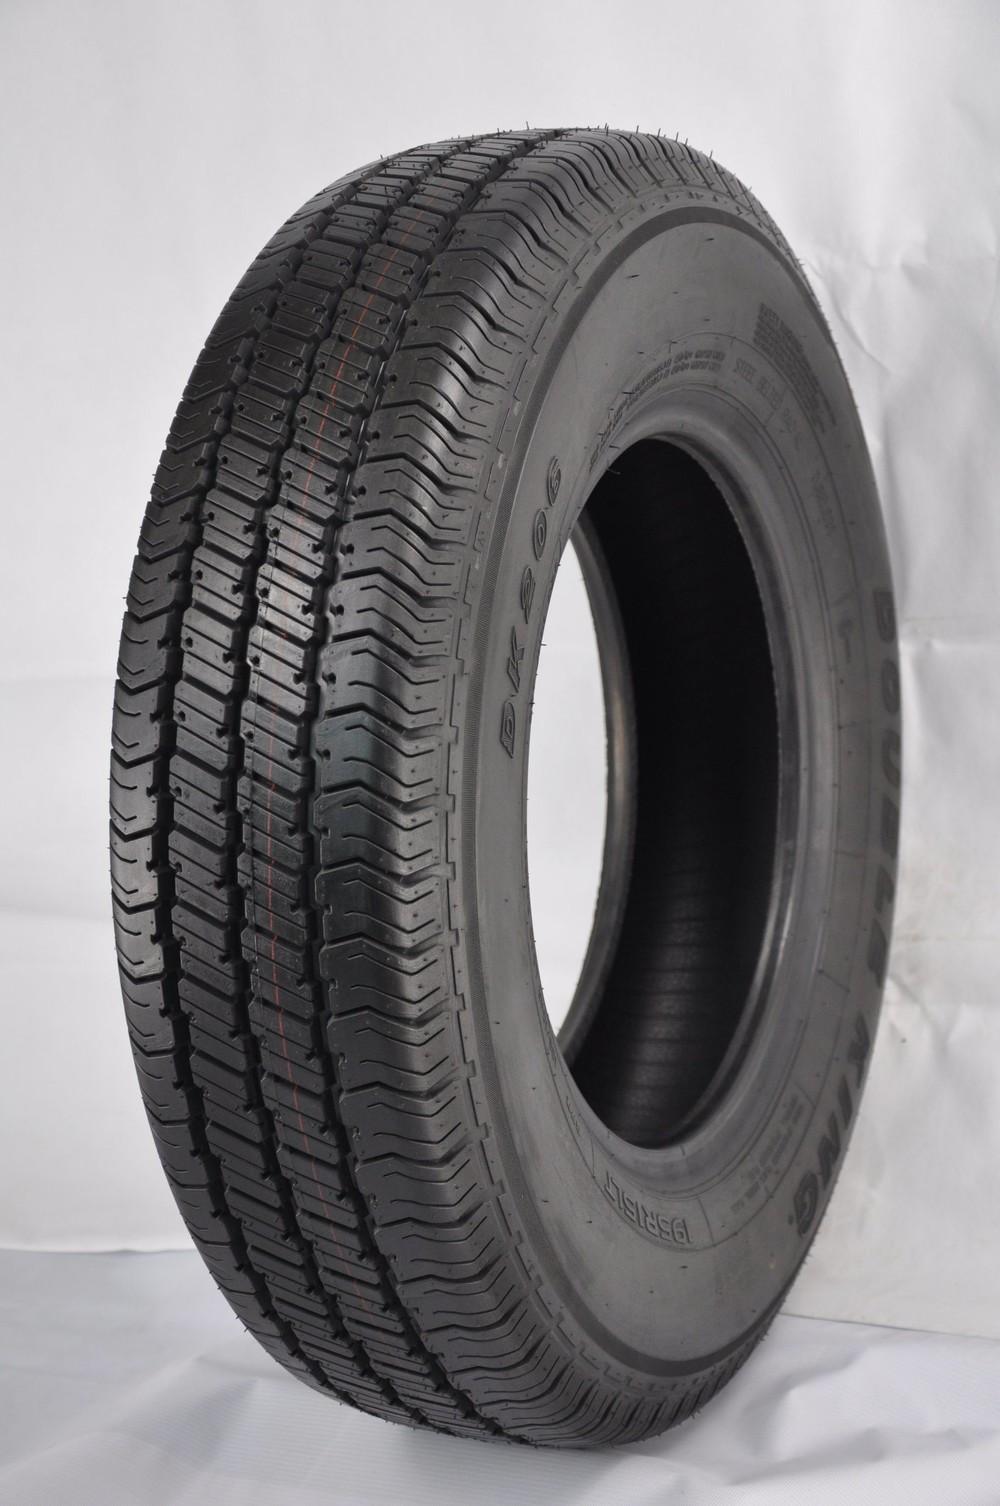 Habilead Kapsen SUV Mt Car Tyres for Sale